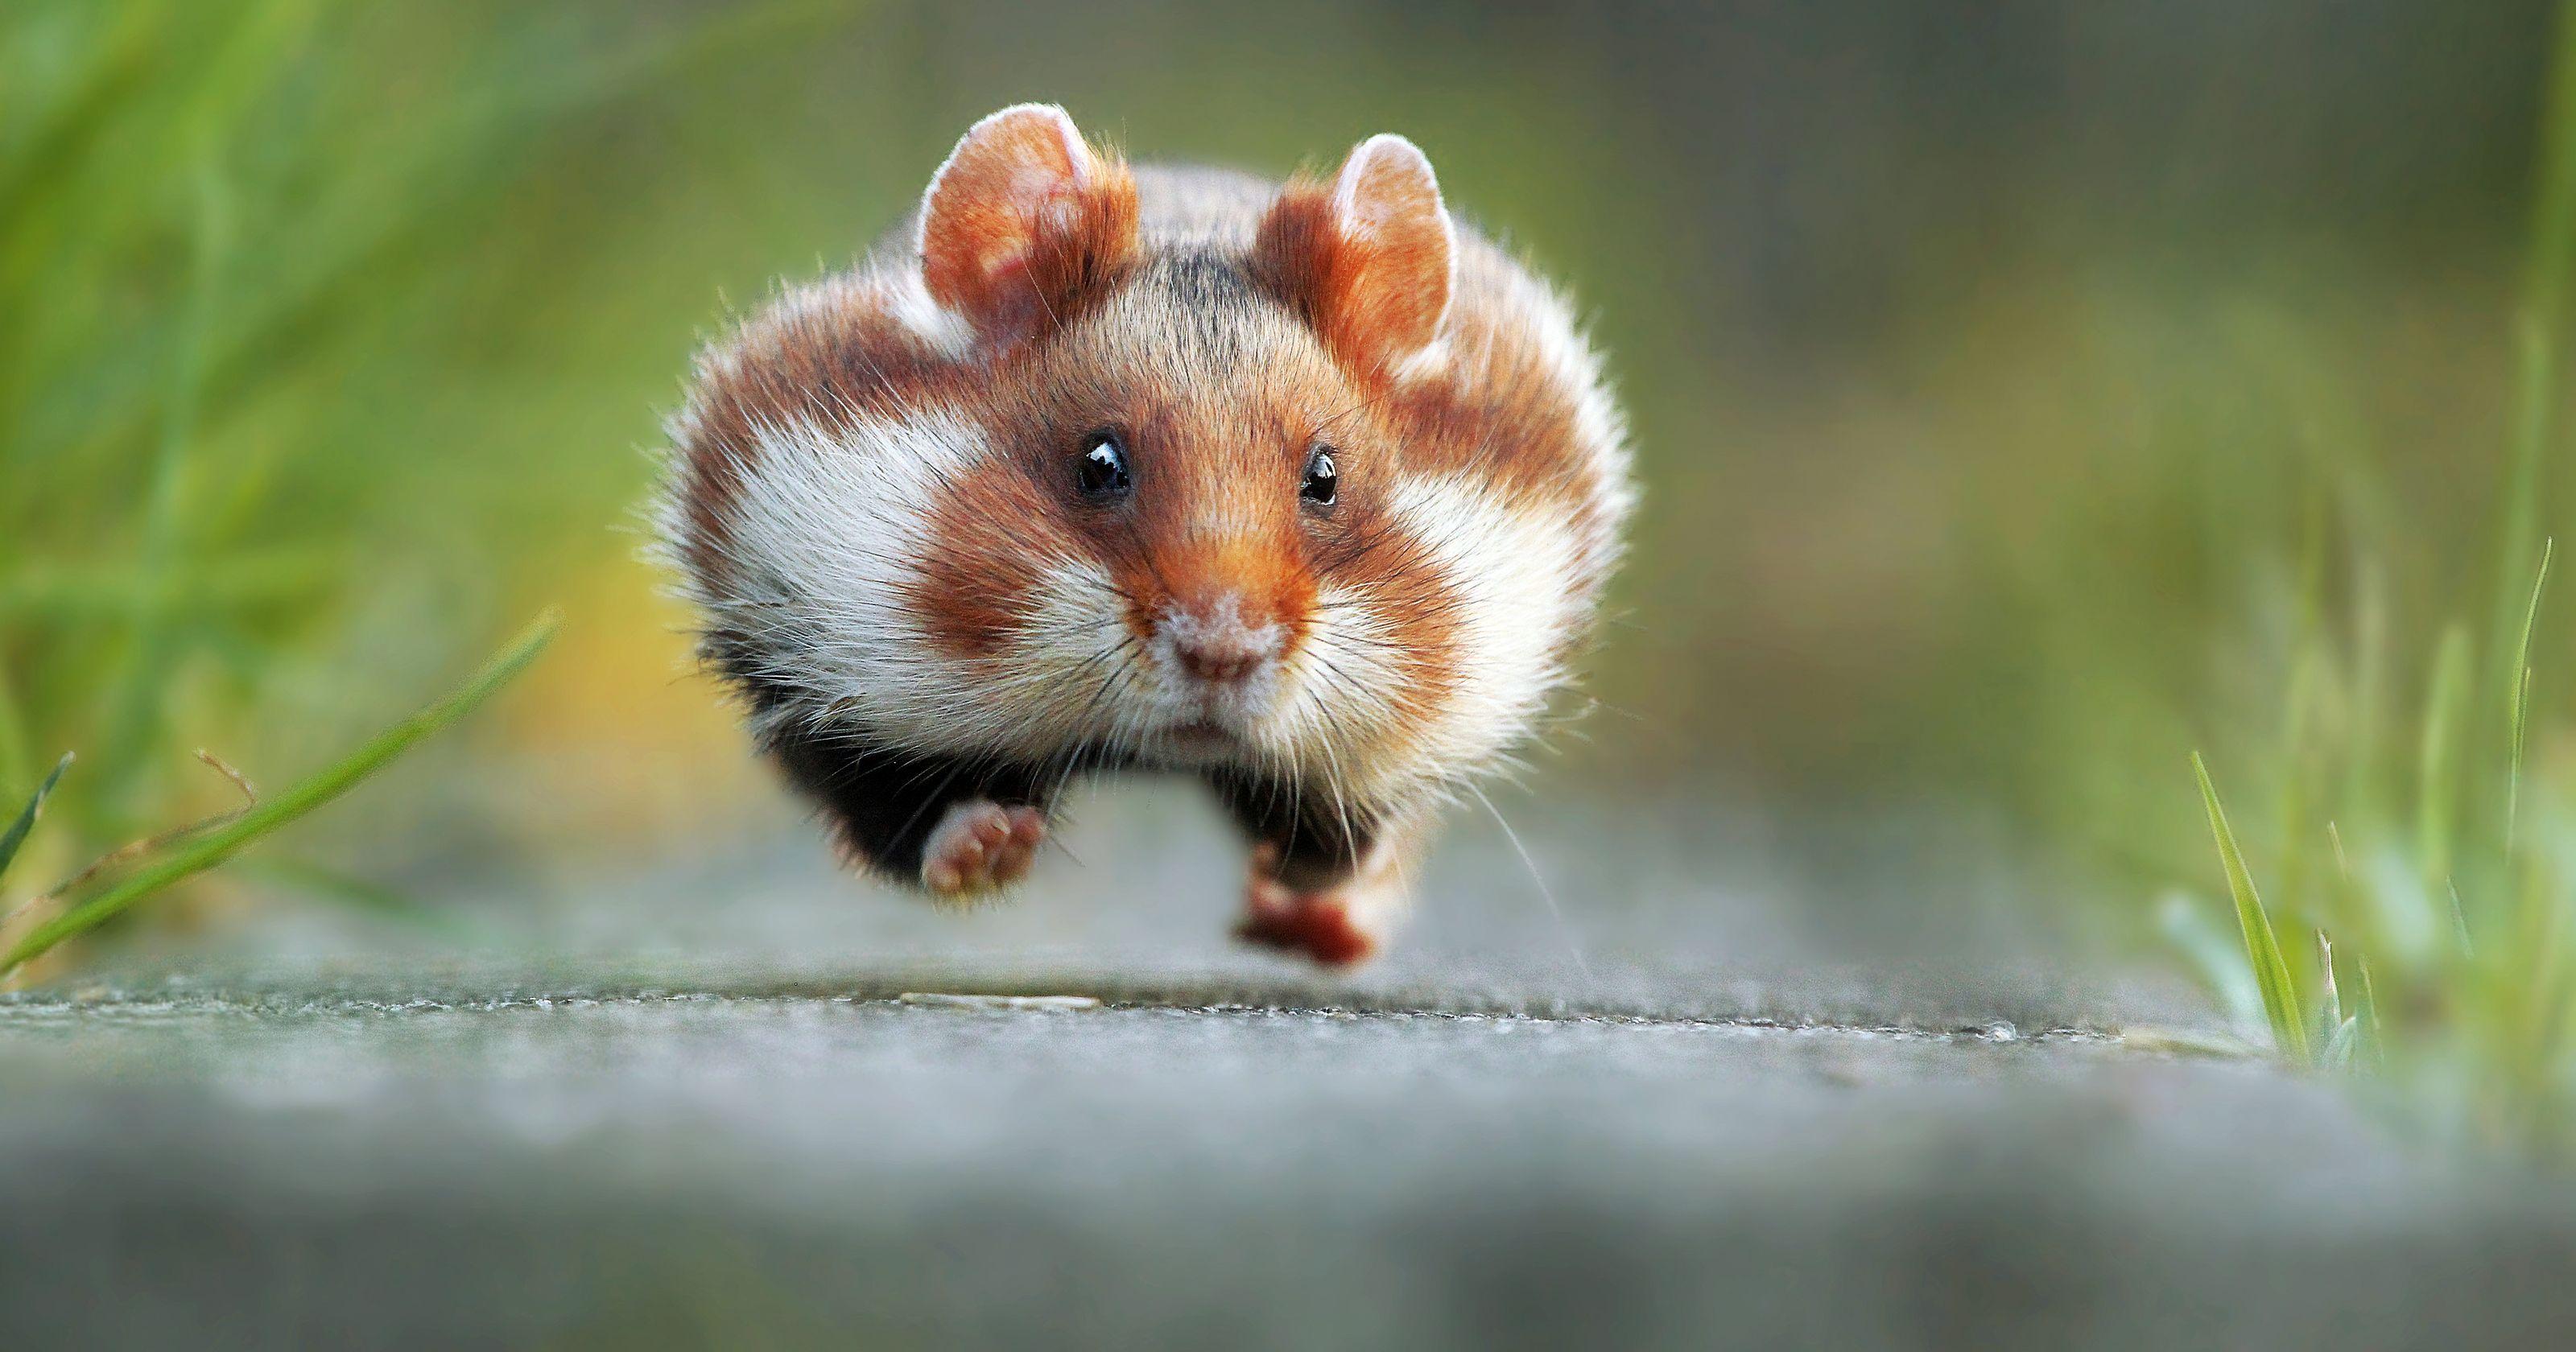 'Comedy' wildlife photos are a hoot